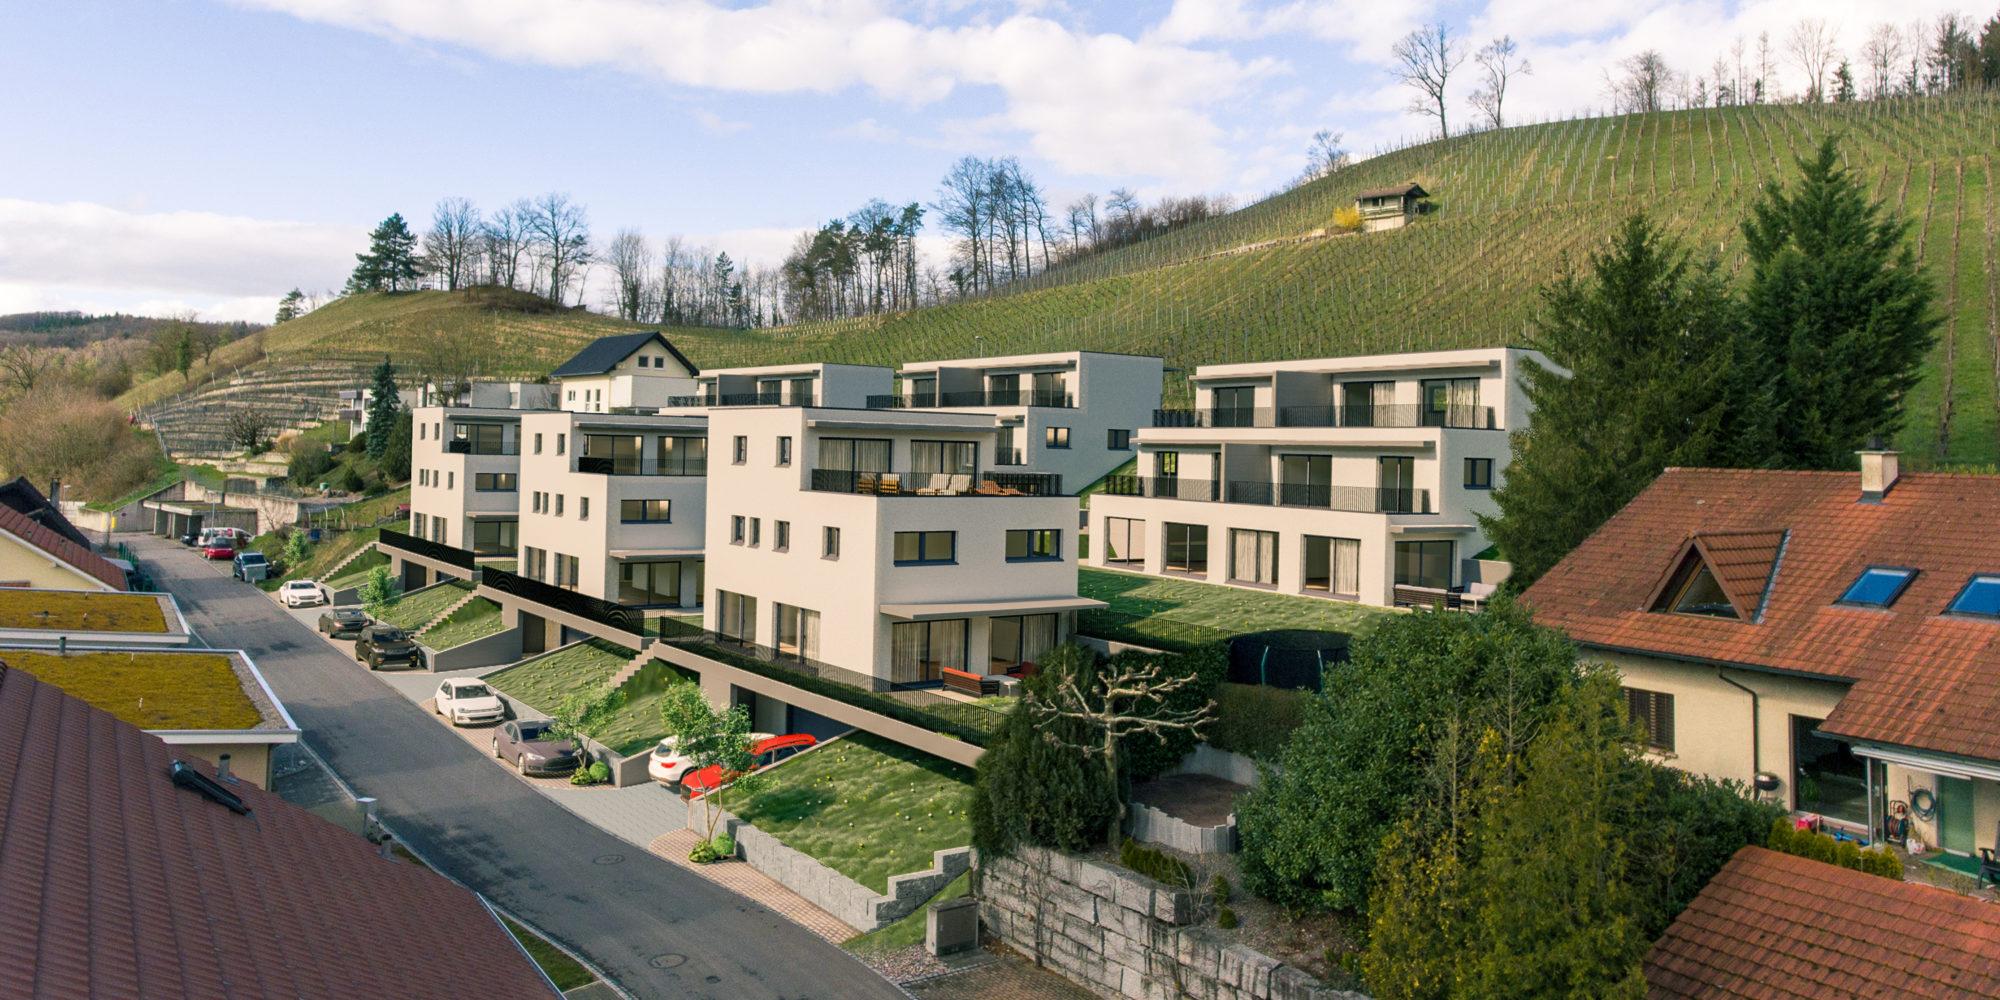 Aargau Zurzach Tegerfelden Weinberg - Tegerfelden